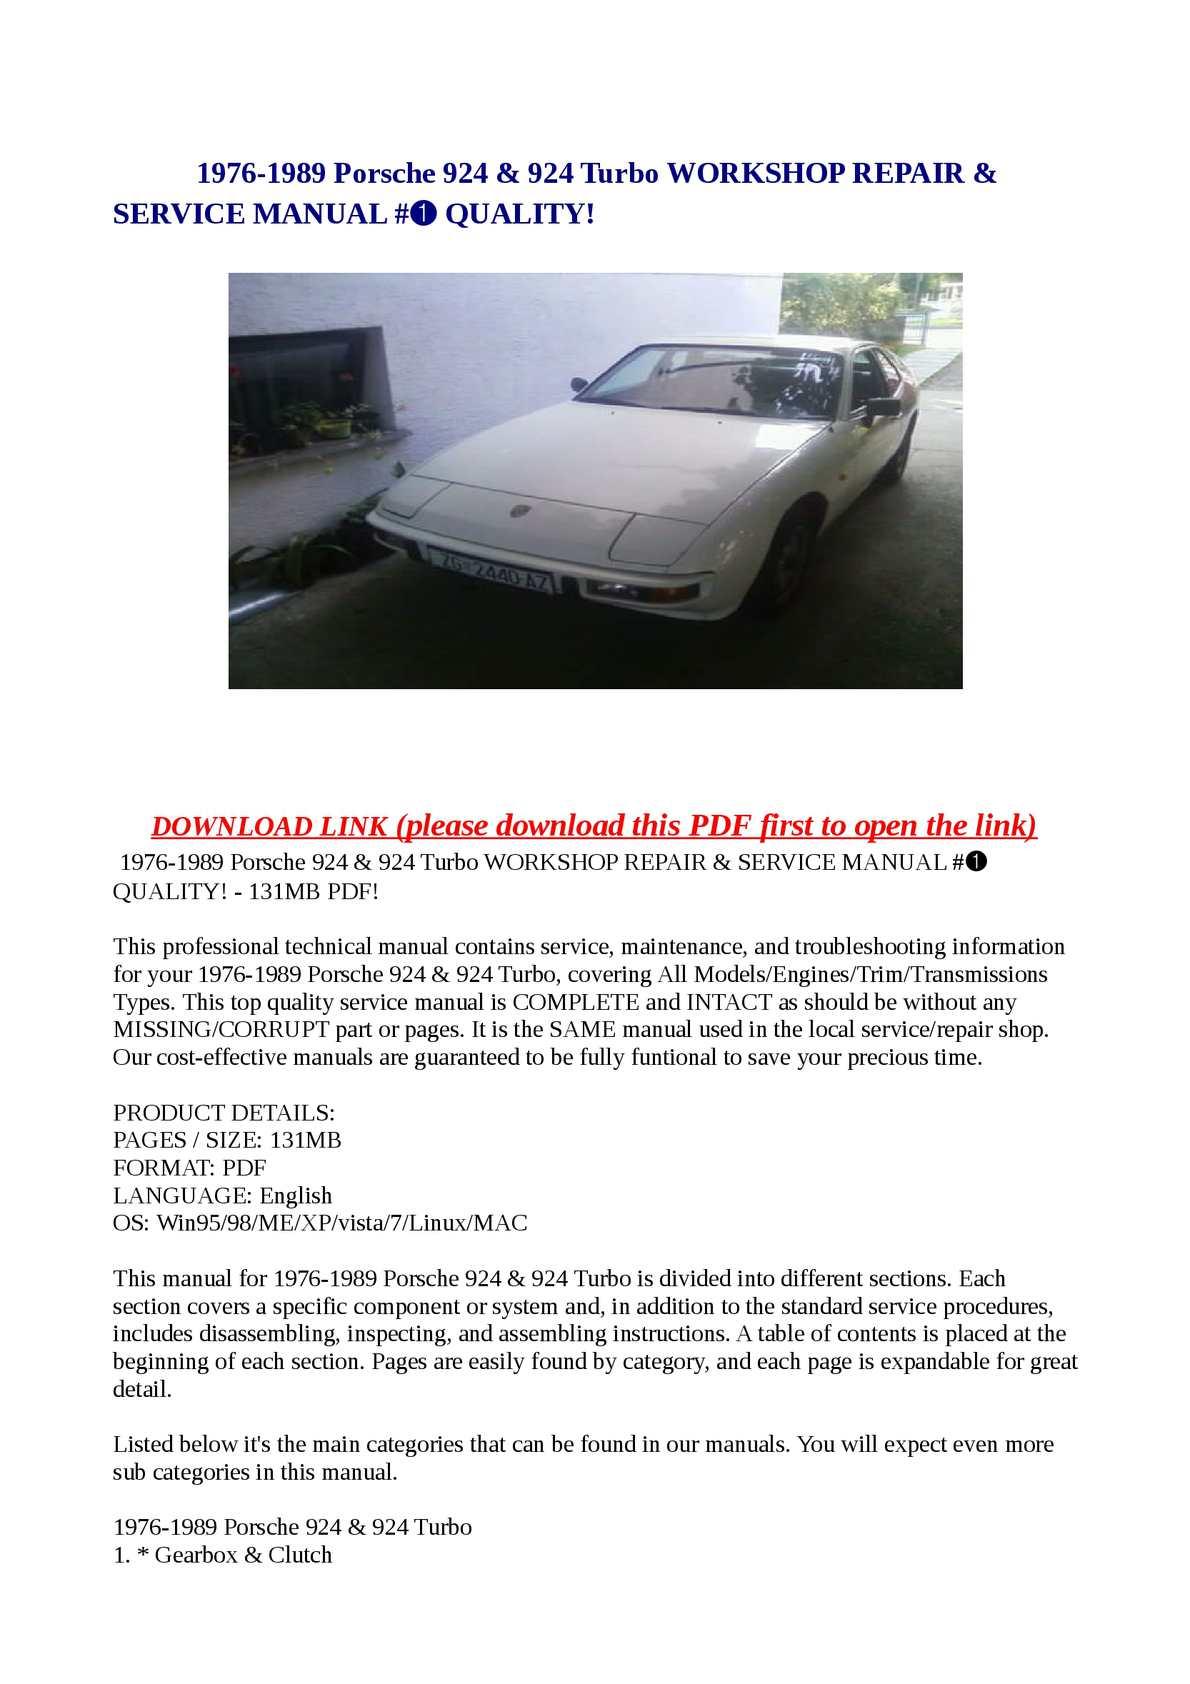 Calaméo - 1976-1989 Porsche 924 & 924 Turbo WORKSHOP REPAIR & SERVICE MANUAL  #➀ QUALITY!